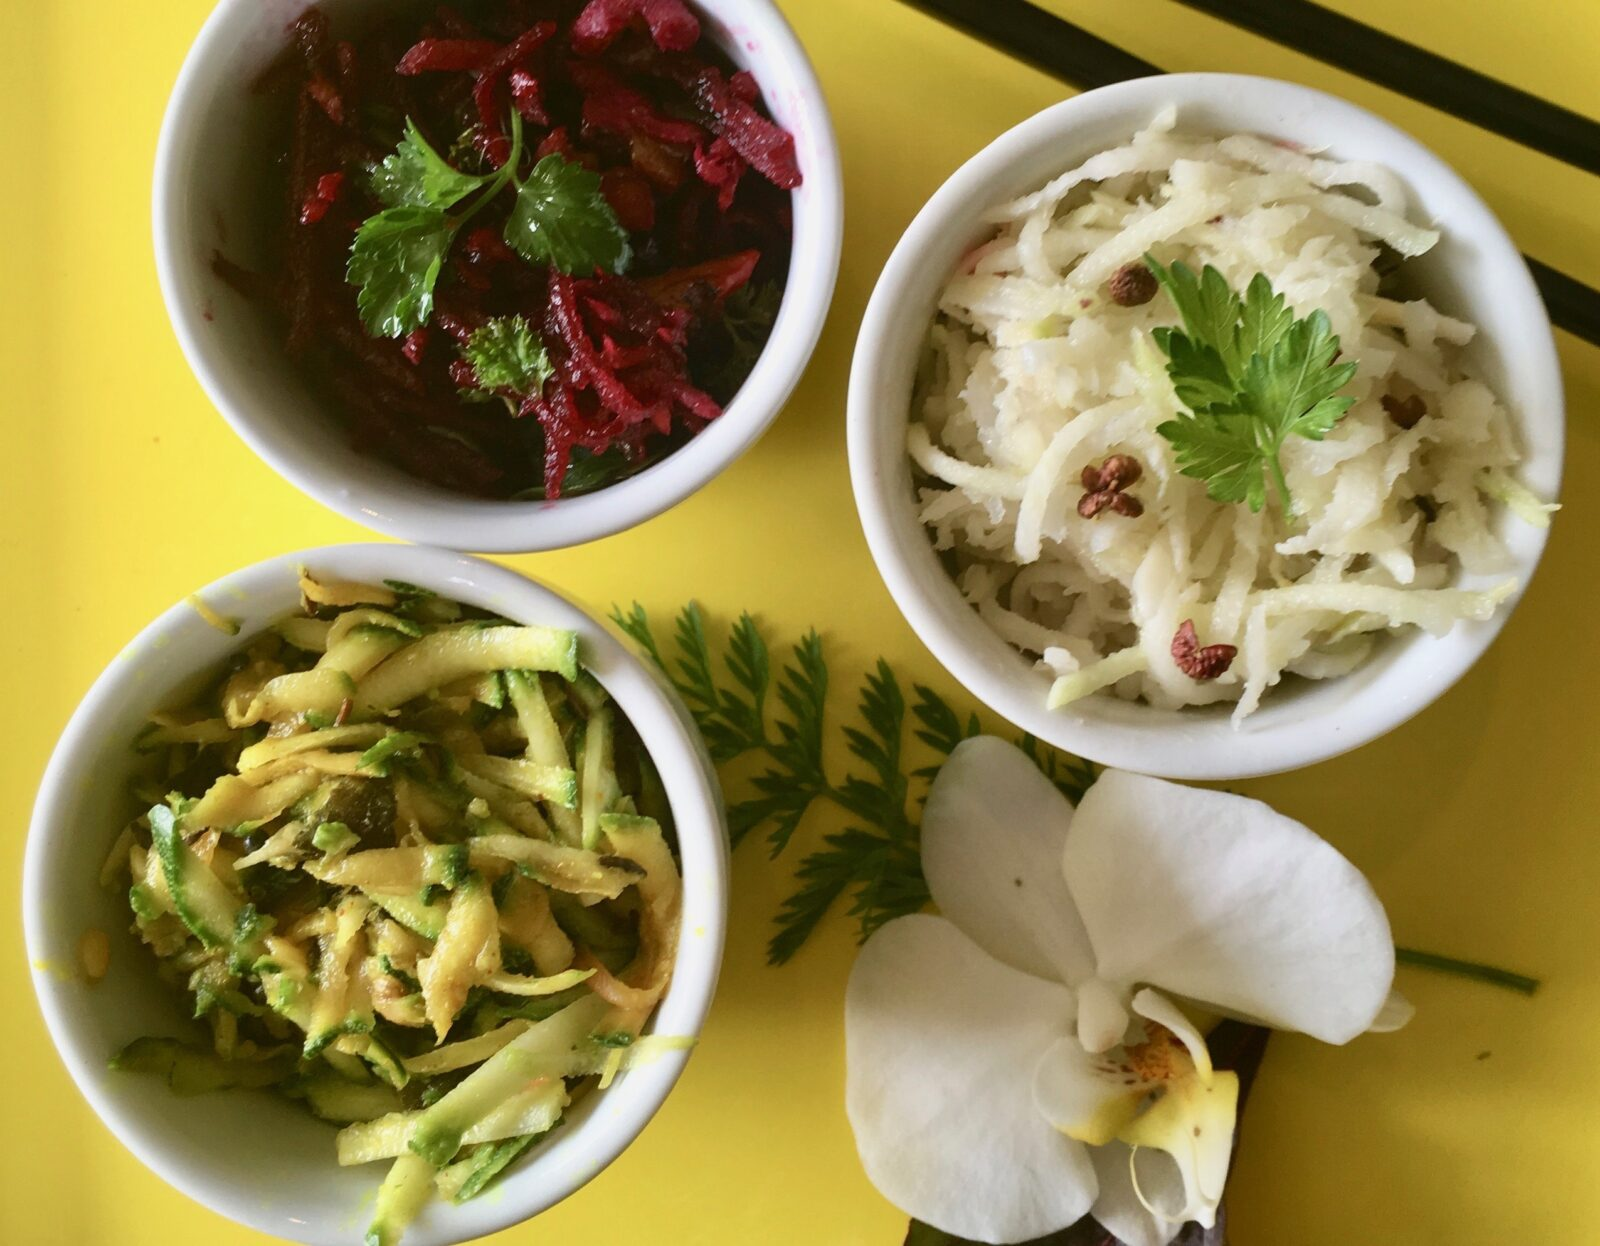 Three bowls of prepared vegetables.